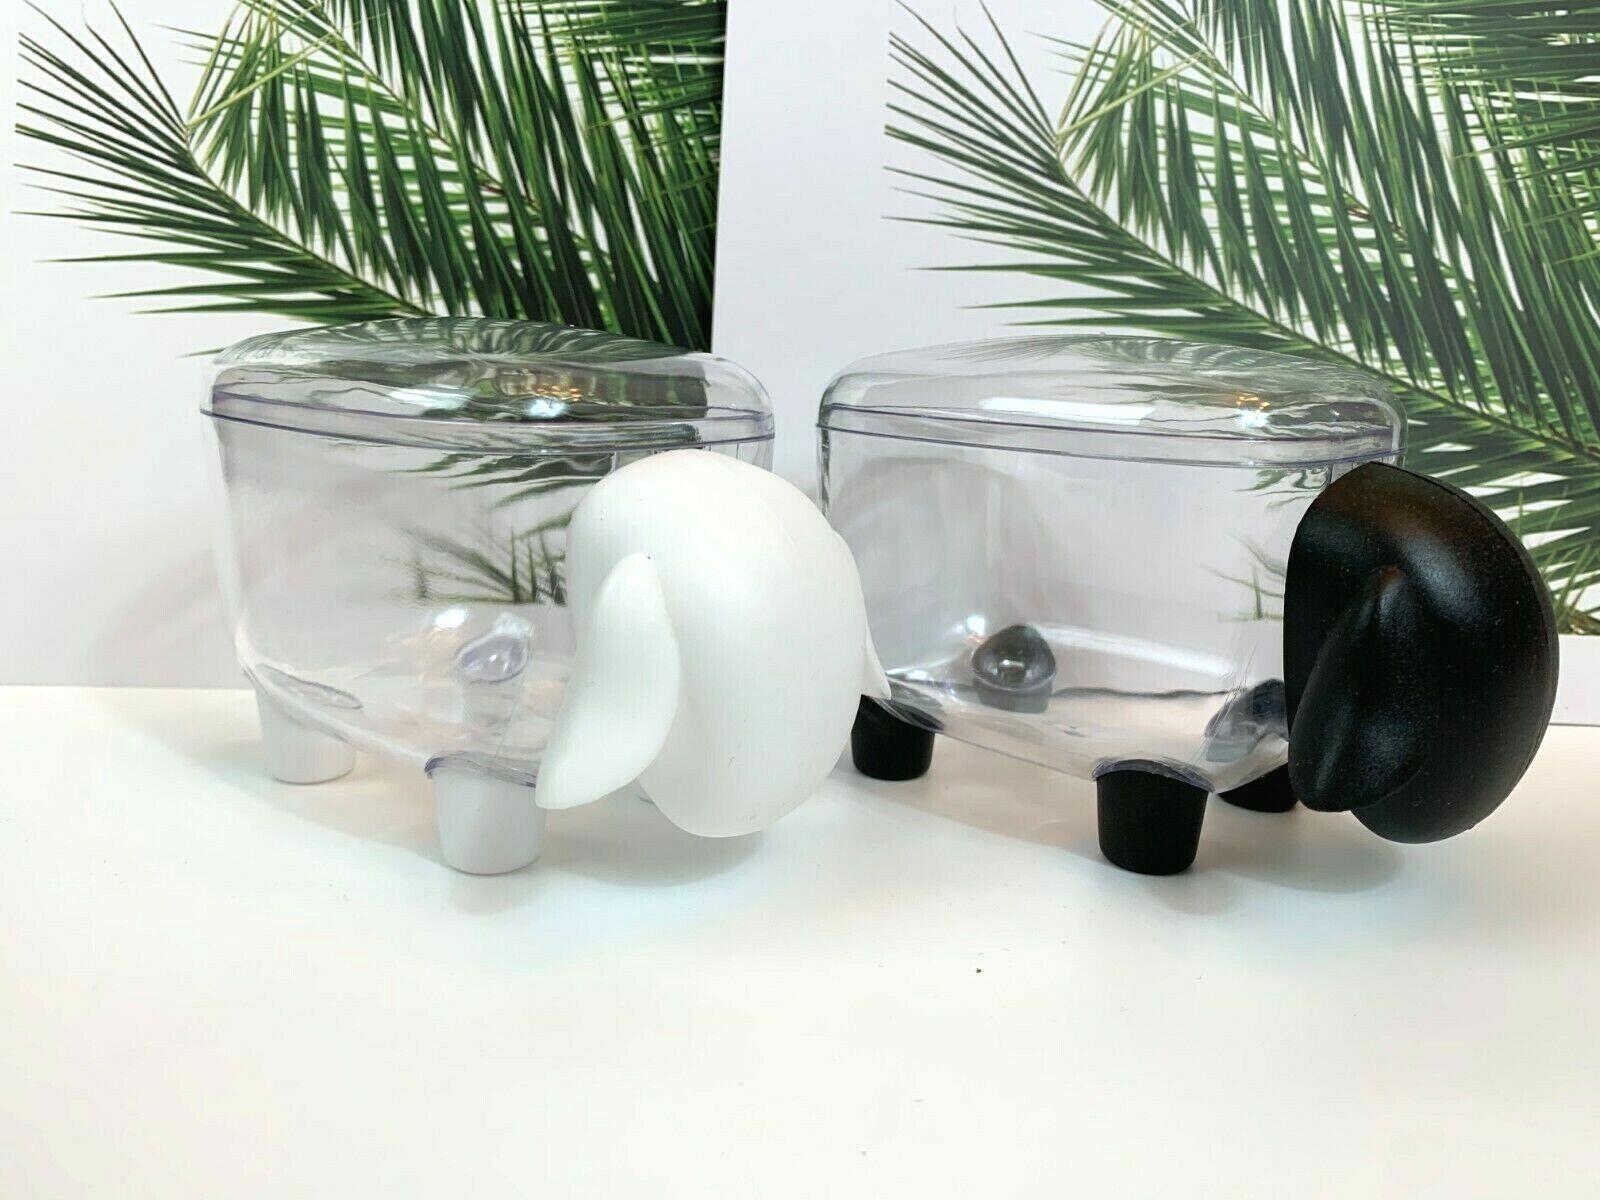 2 sheep-shaped diespenser comtainer boxes for small items(black white)